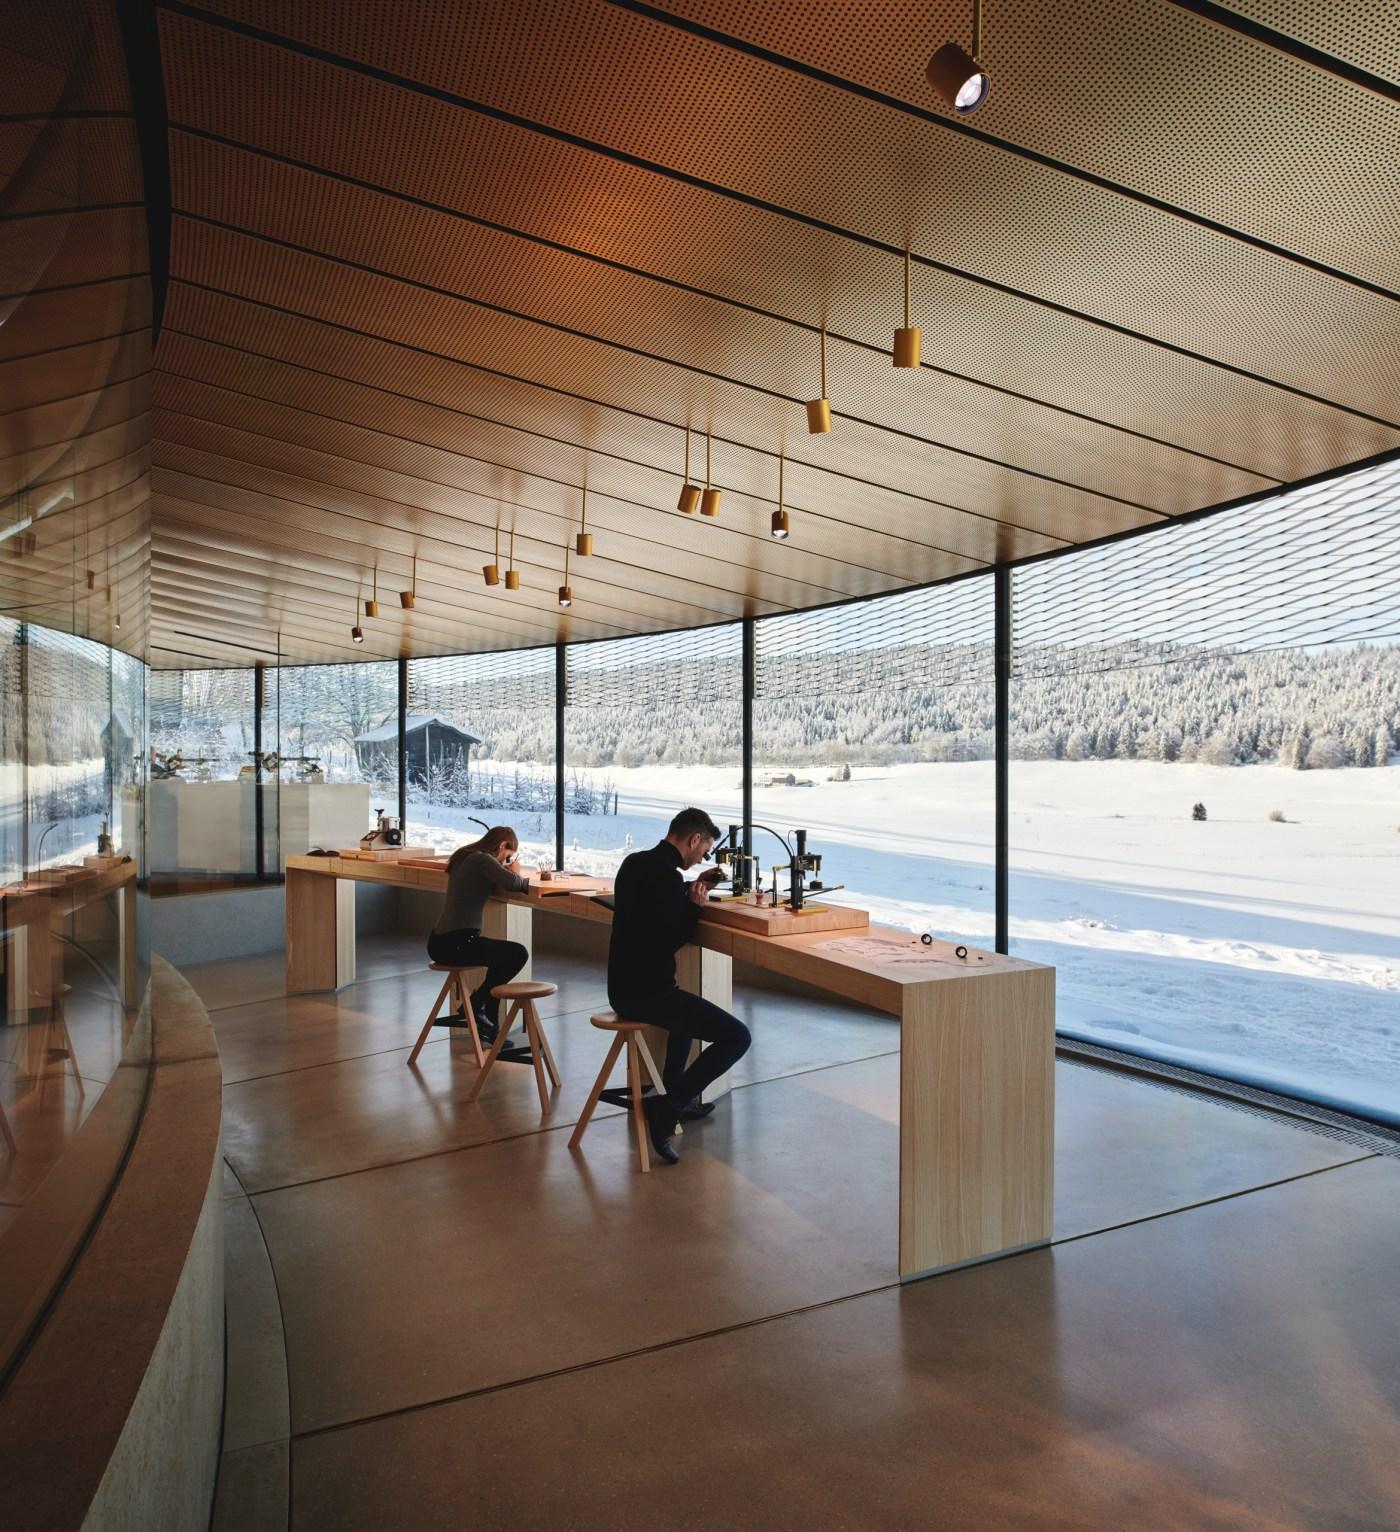 Musee Atelier Audemars Piguet interior